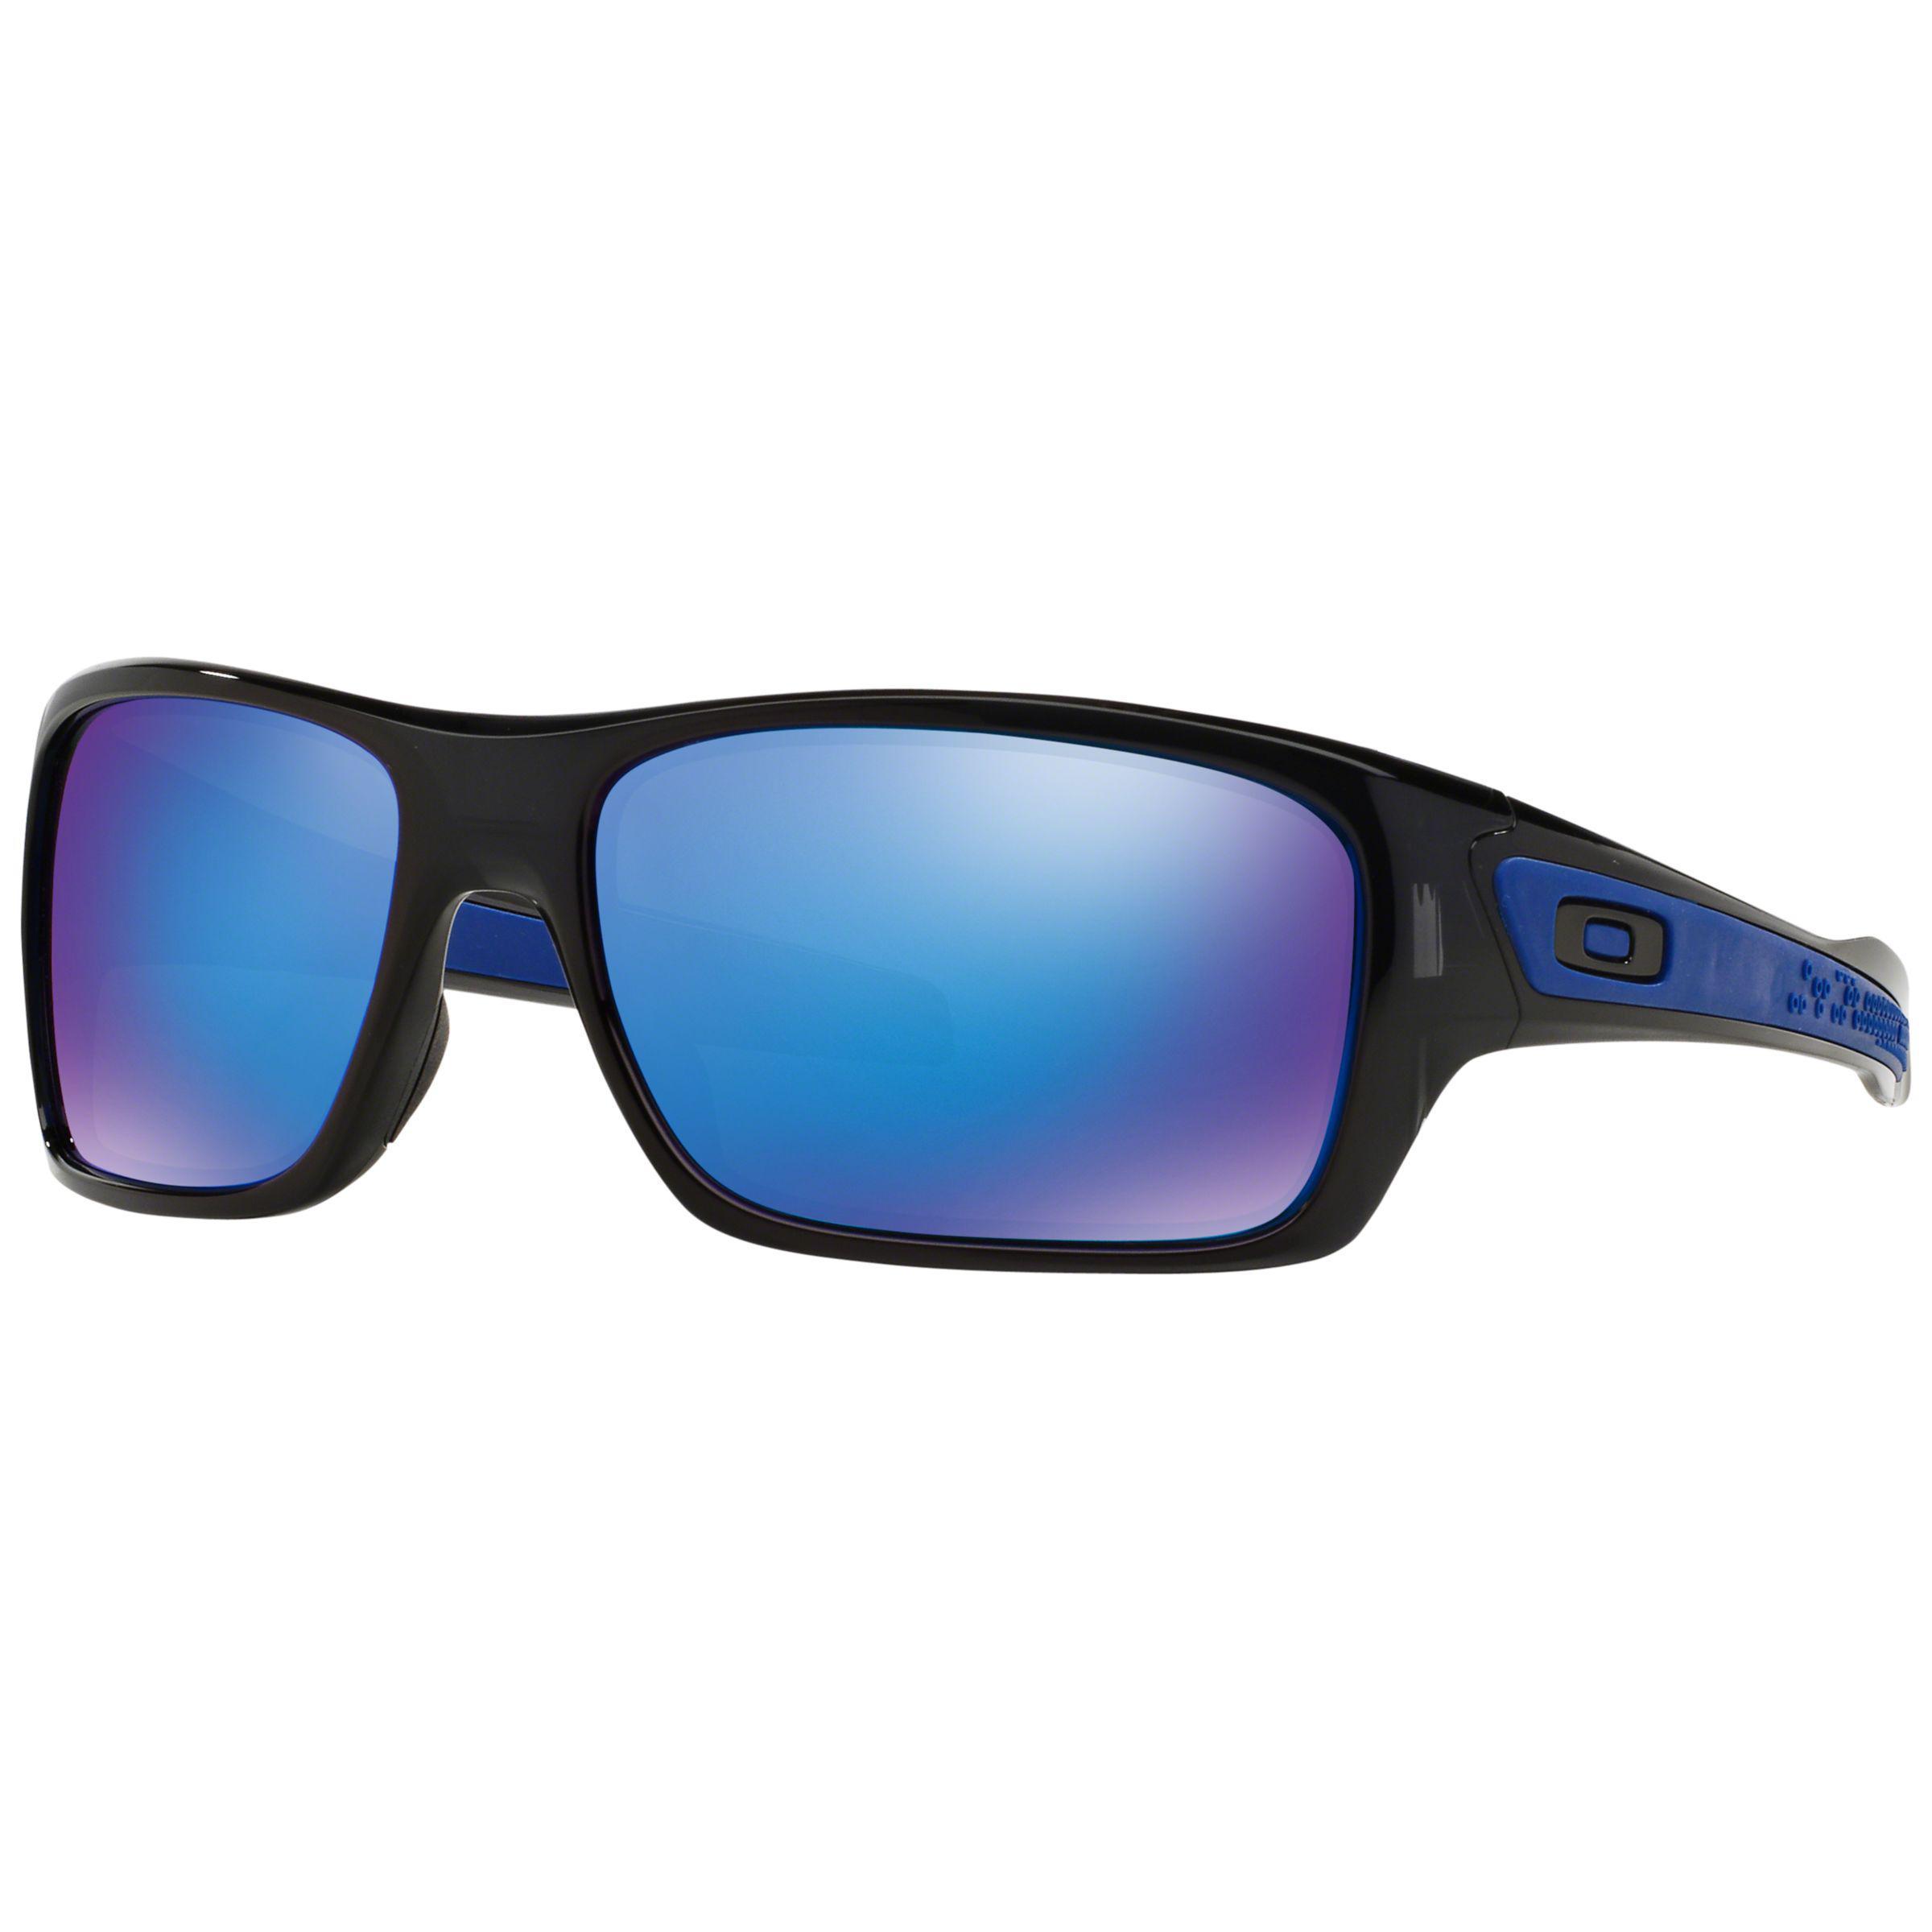 e2559132d4 get oakley turbine rotor sunglasses f6653 5b71c  purchase oakley. mens blue  oo9263 turbine rectangular sunglasses f1d50 e79cd